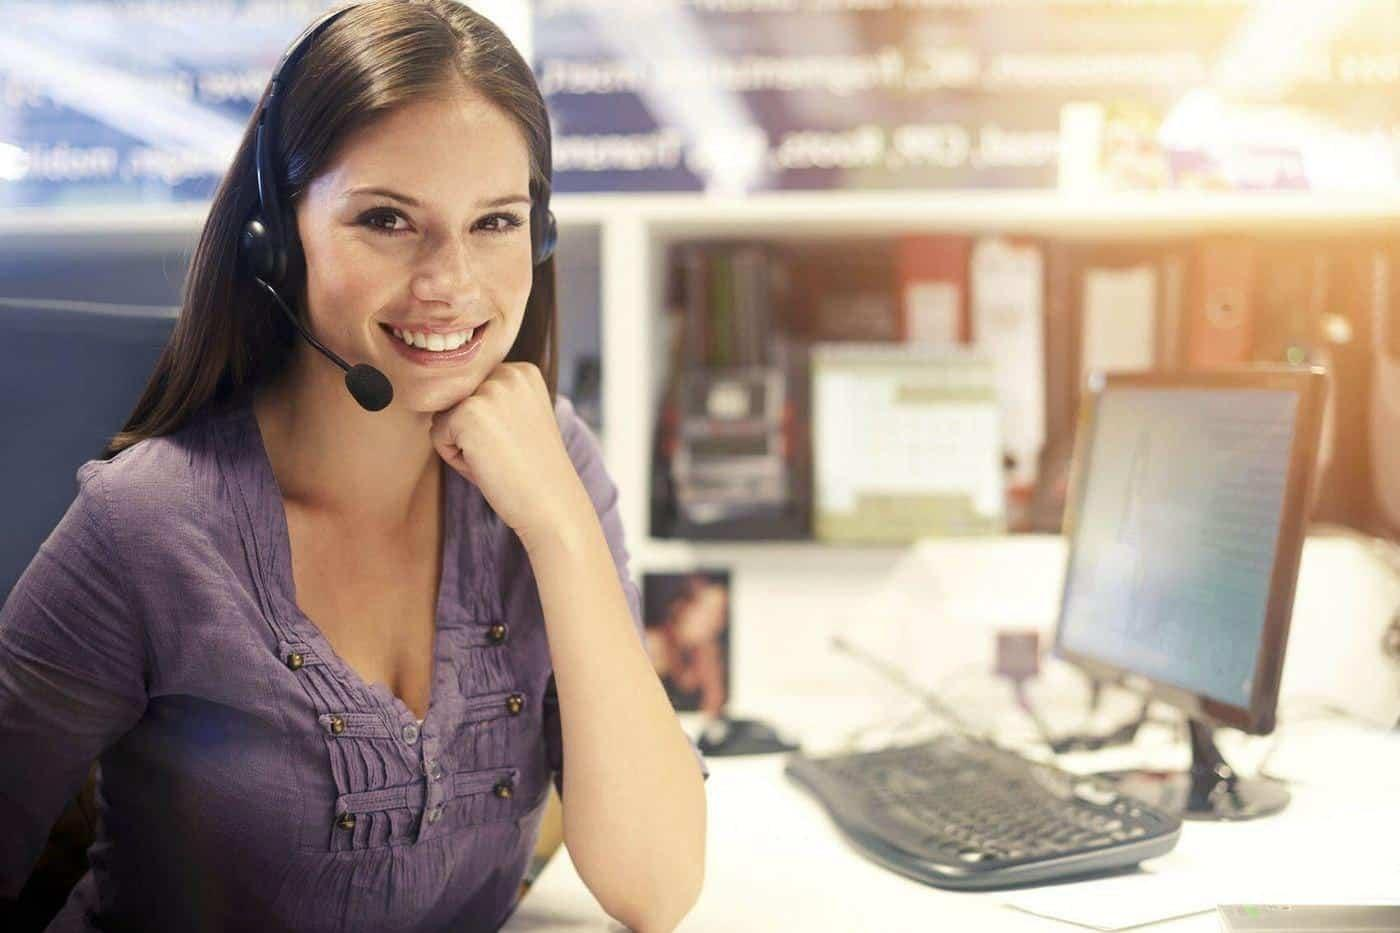 customer focused service